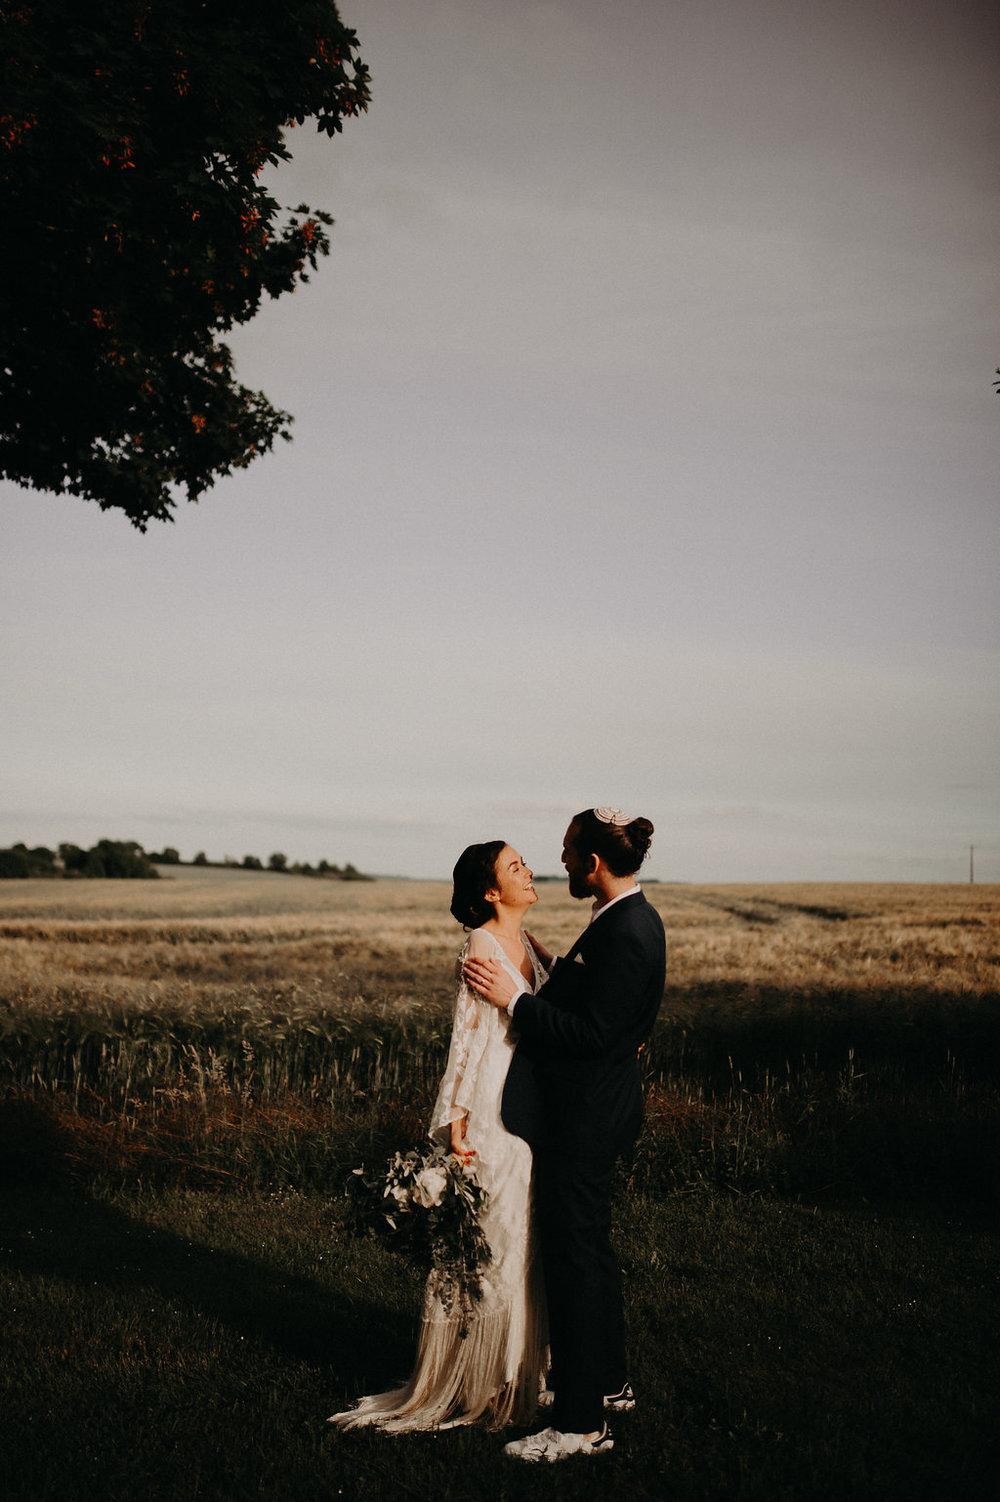 photographe_mariage_bohemechic (2).jpg